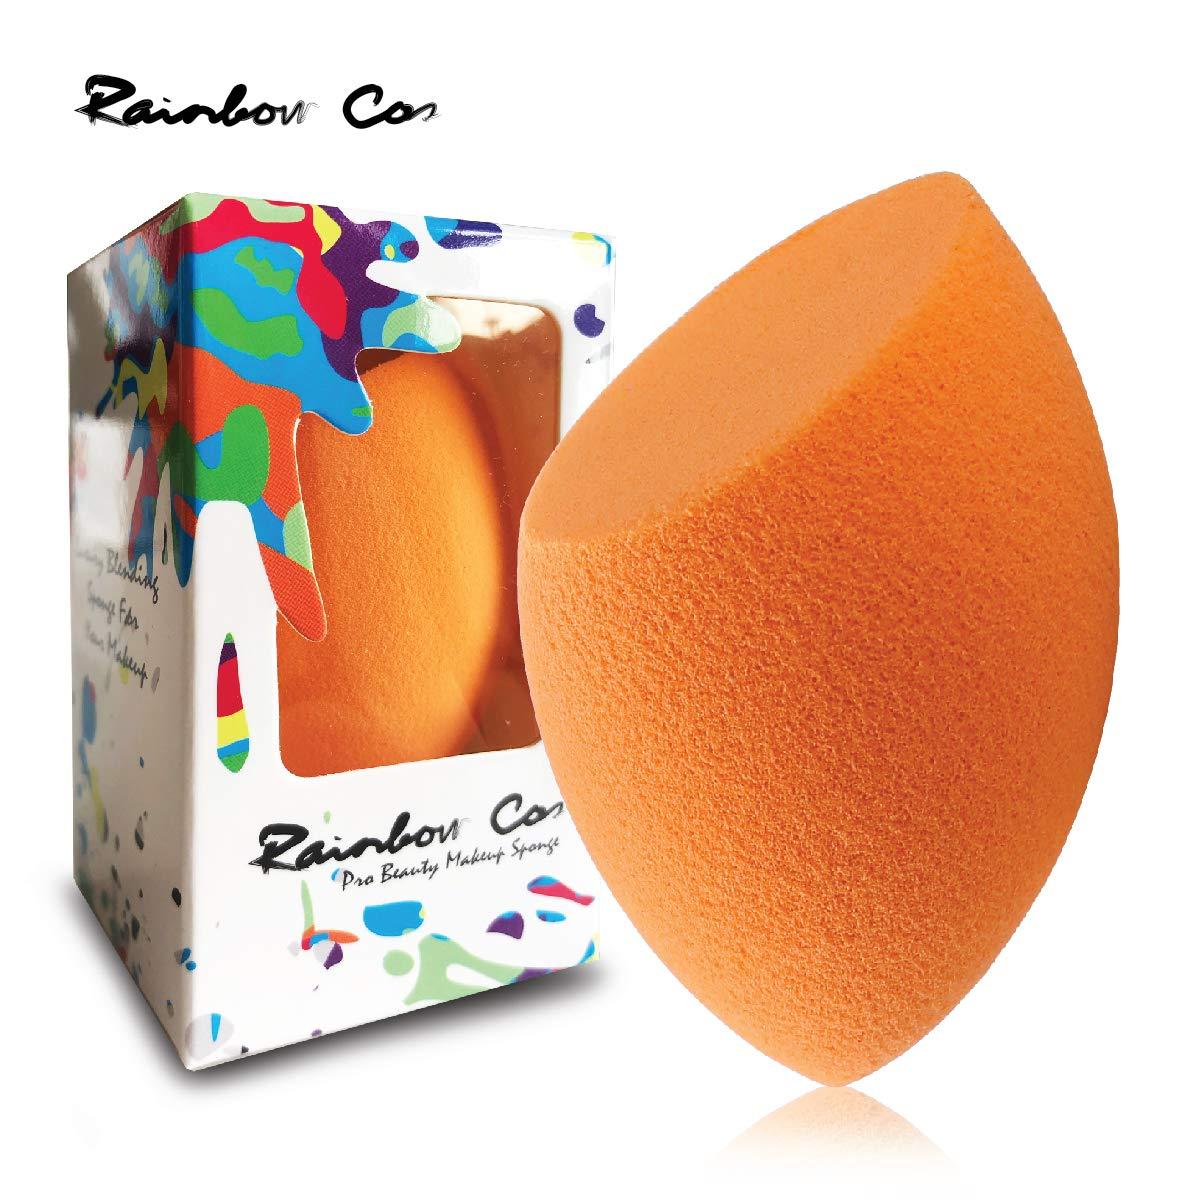 Rainbow Cos Premium Flat Edge Olive Sponge Beauty Foundation Sponge Blender for Applicator, Foundation and Highlight (Orange)